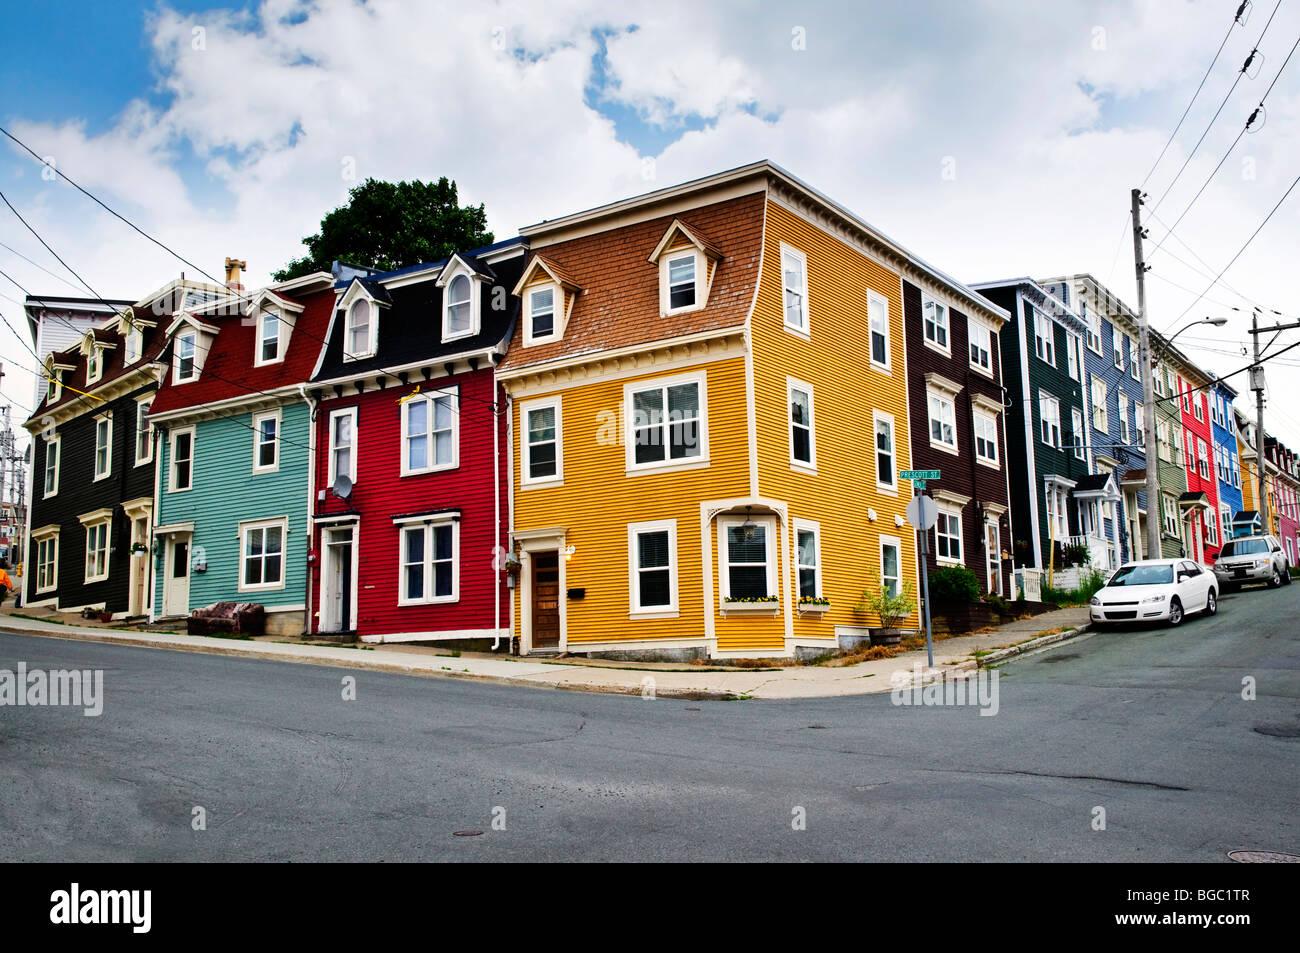 Colorful houses on street corner in st john 39 s for Newfoundland houses